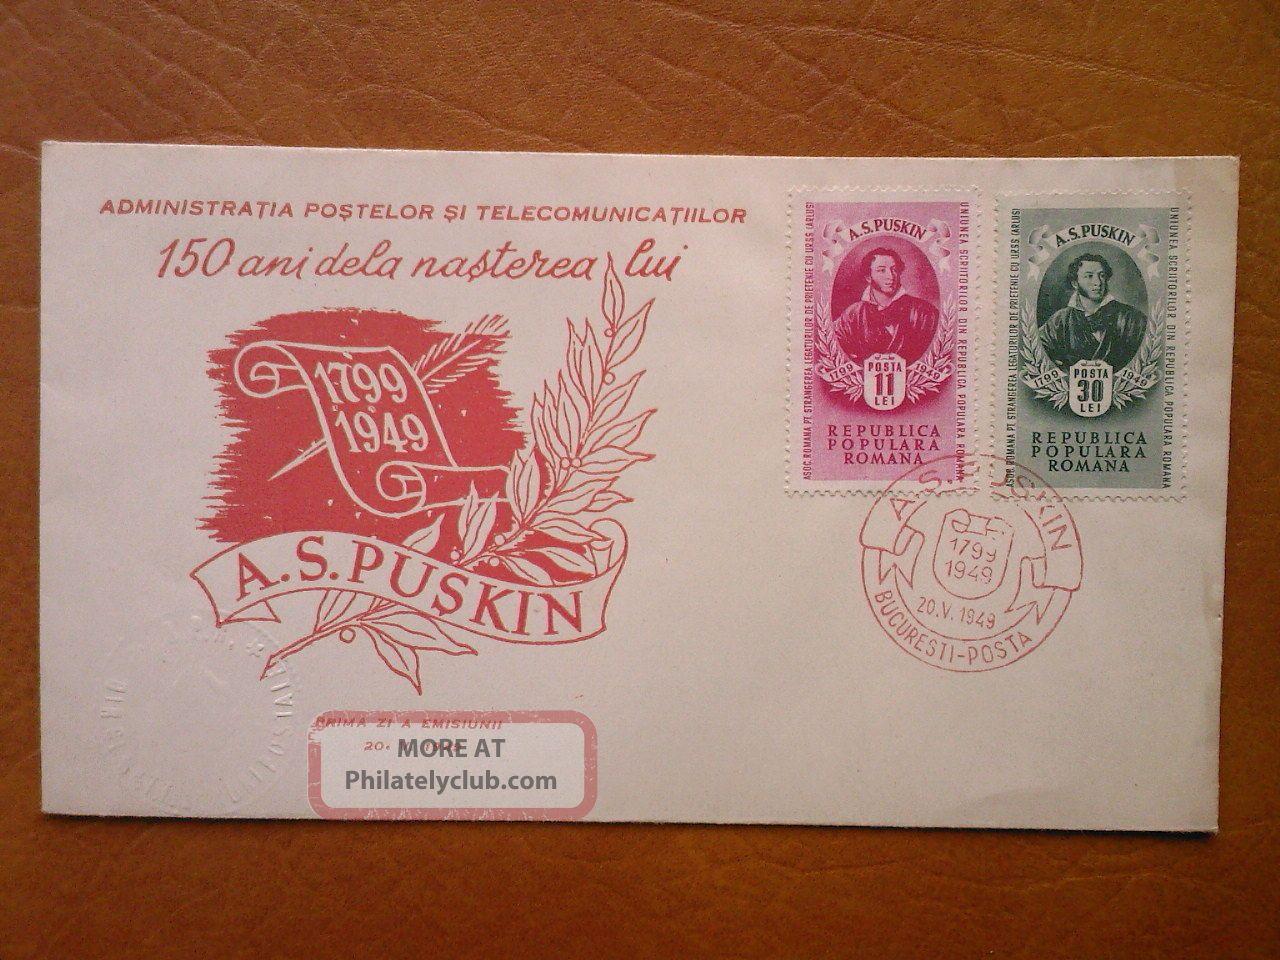 1949 - Puskin - F.  D.  C.  3629 Worldwide photo